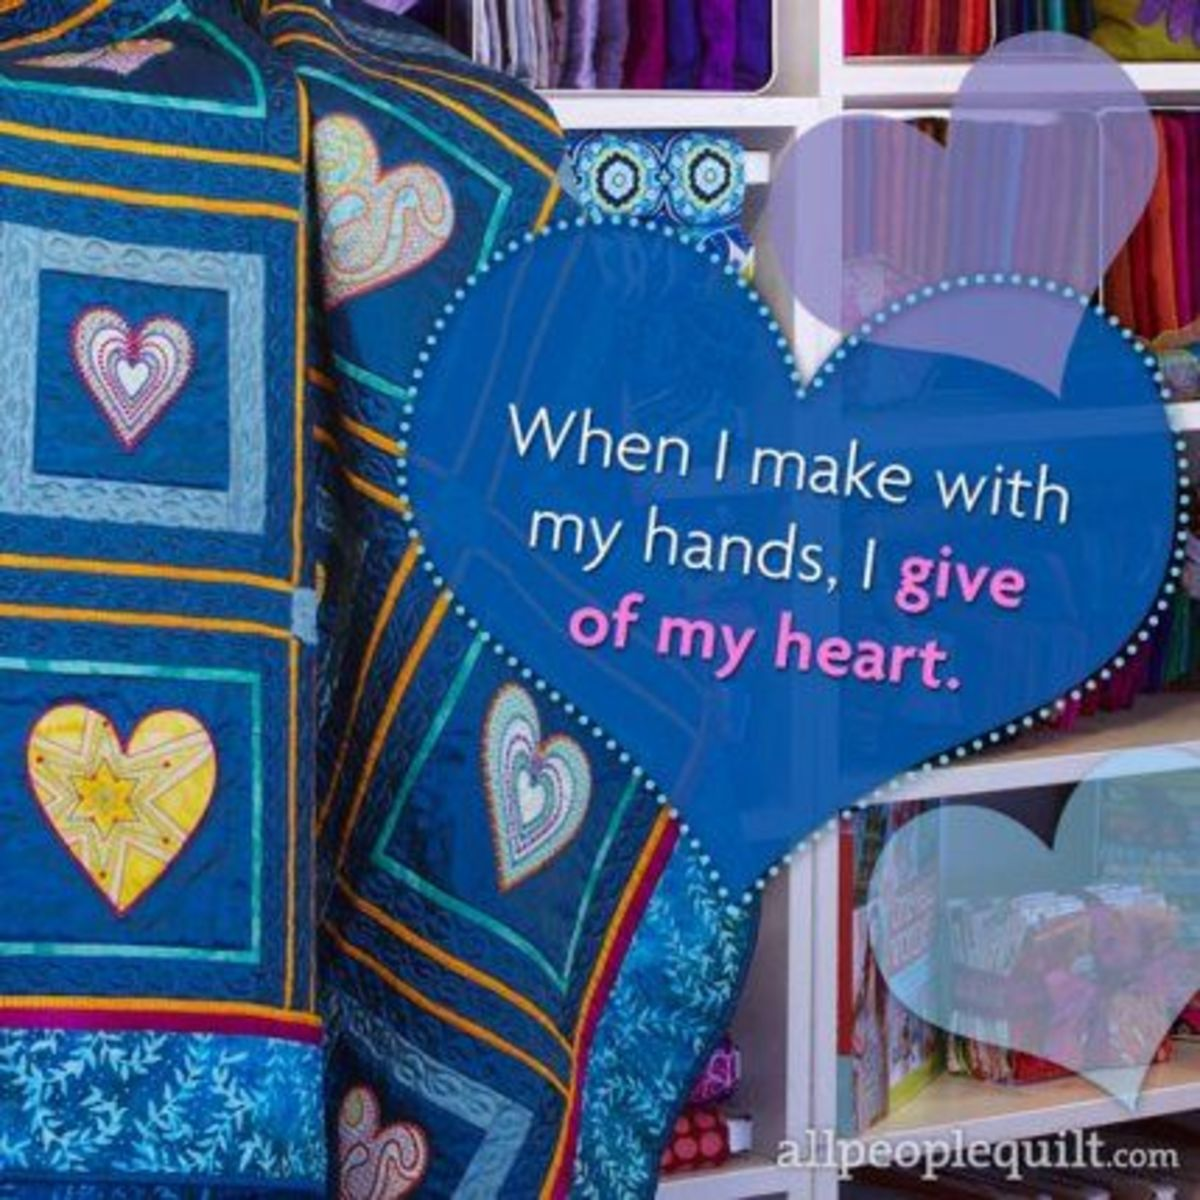 Handmade is personal.